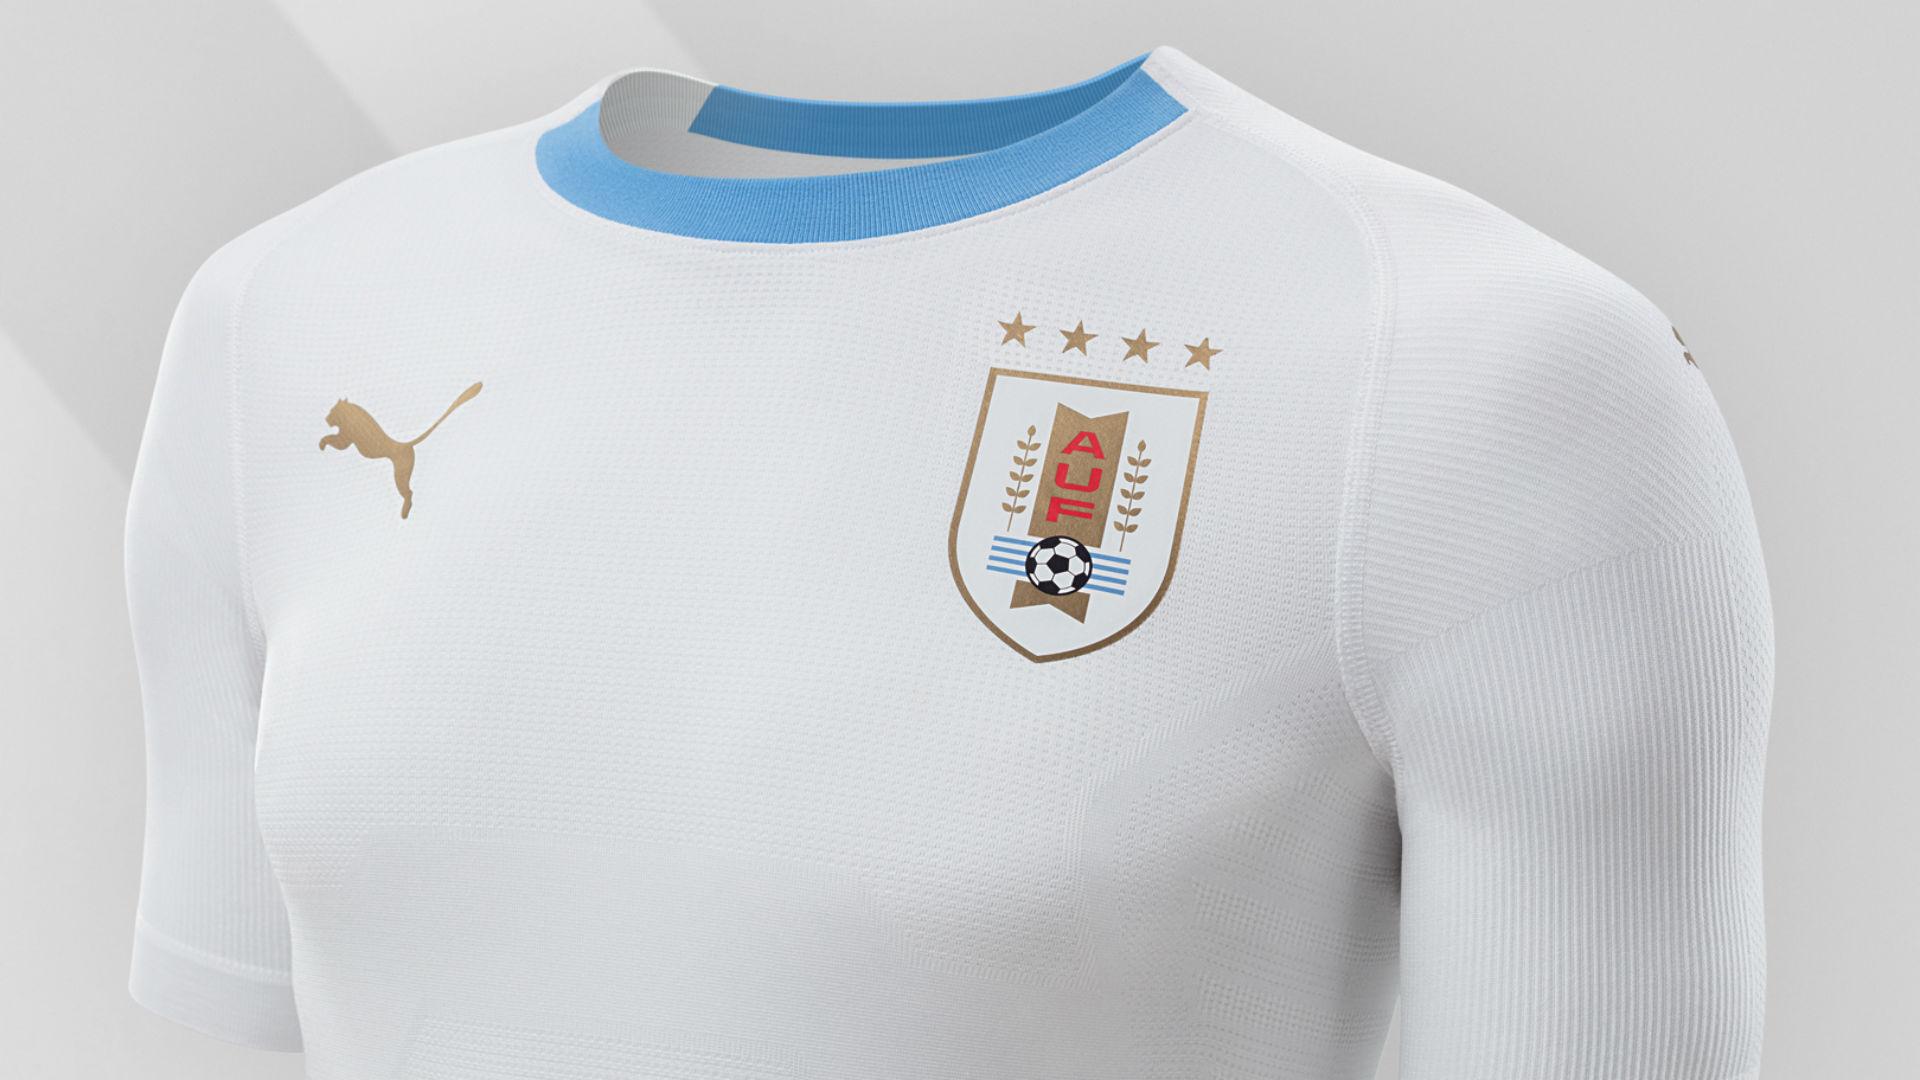 Top England Jersey World Cup 2018 - uruguay-kit-2018_15g5gawo7ogpi1kq3ul0kvd2xa  Best Photo Reference_714987 .jpg?t\u003d1054343506